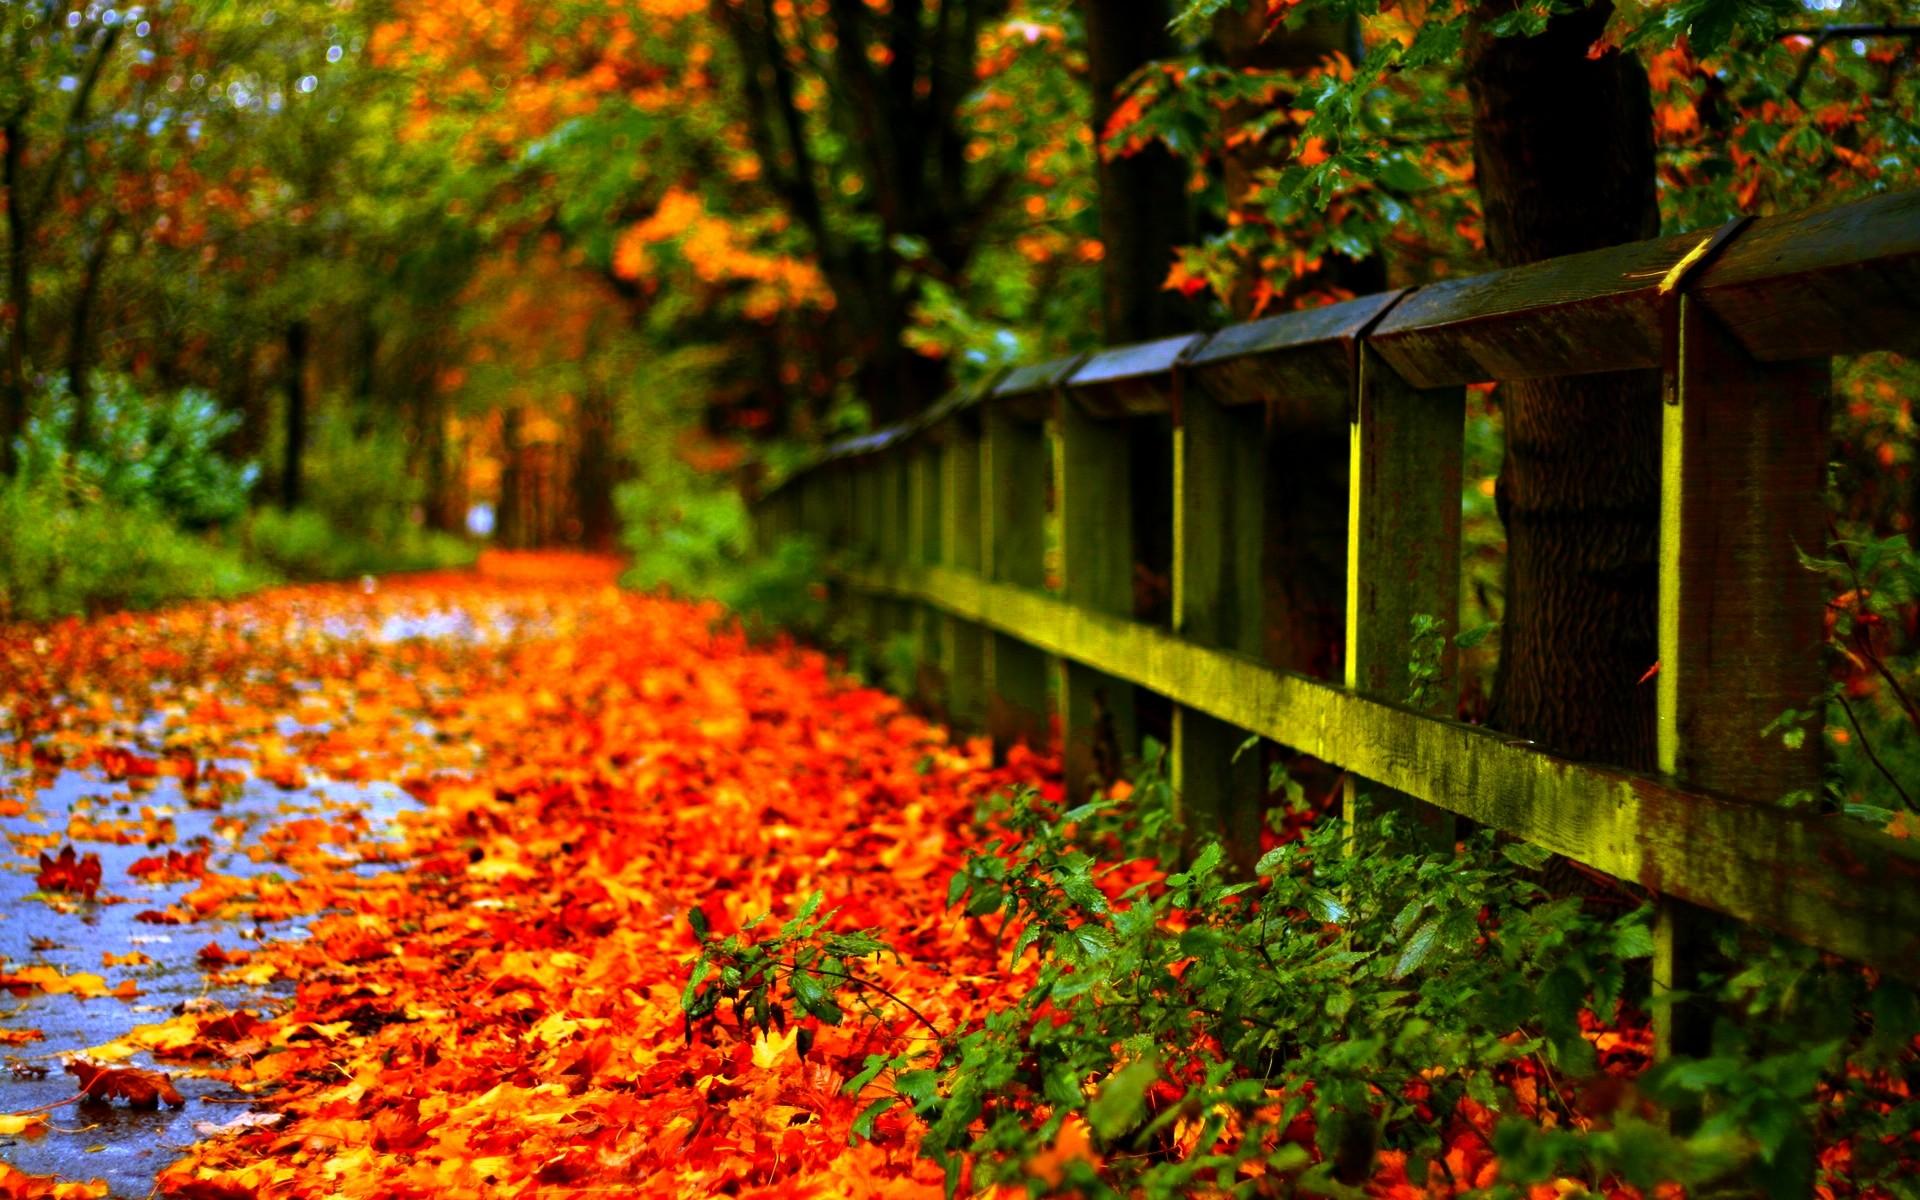 Fall Leaves Wallpaper Macbook Fall Colors Wallpaper Background 183 ① Wallpapertag